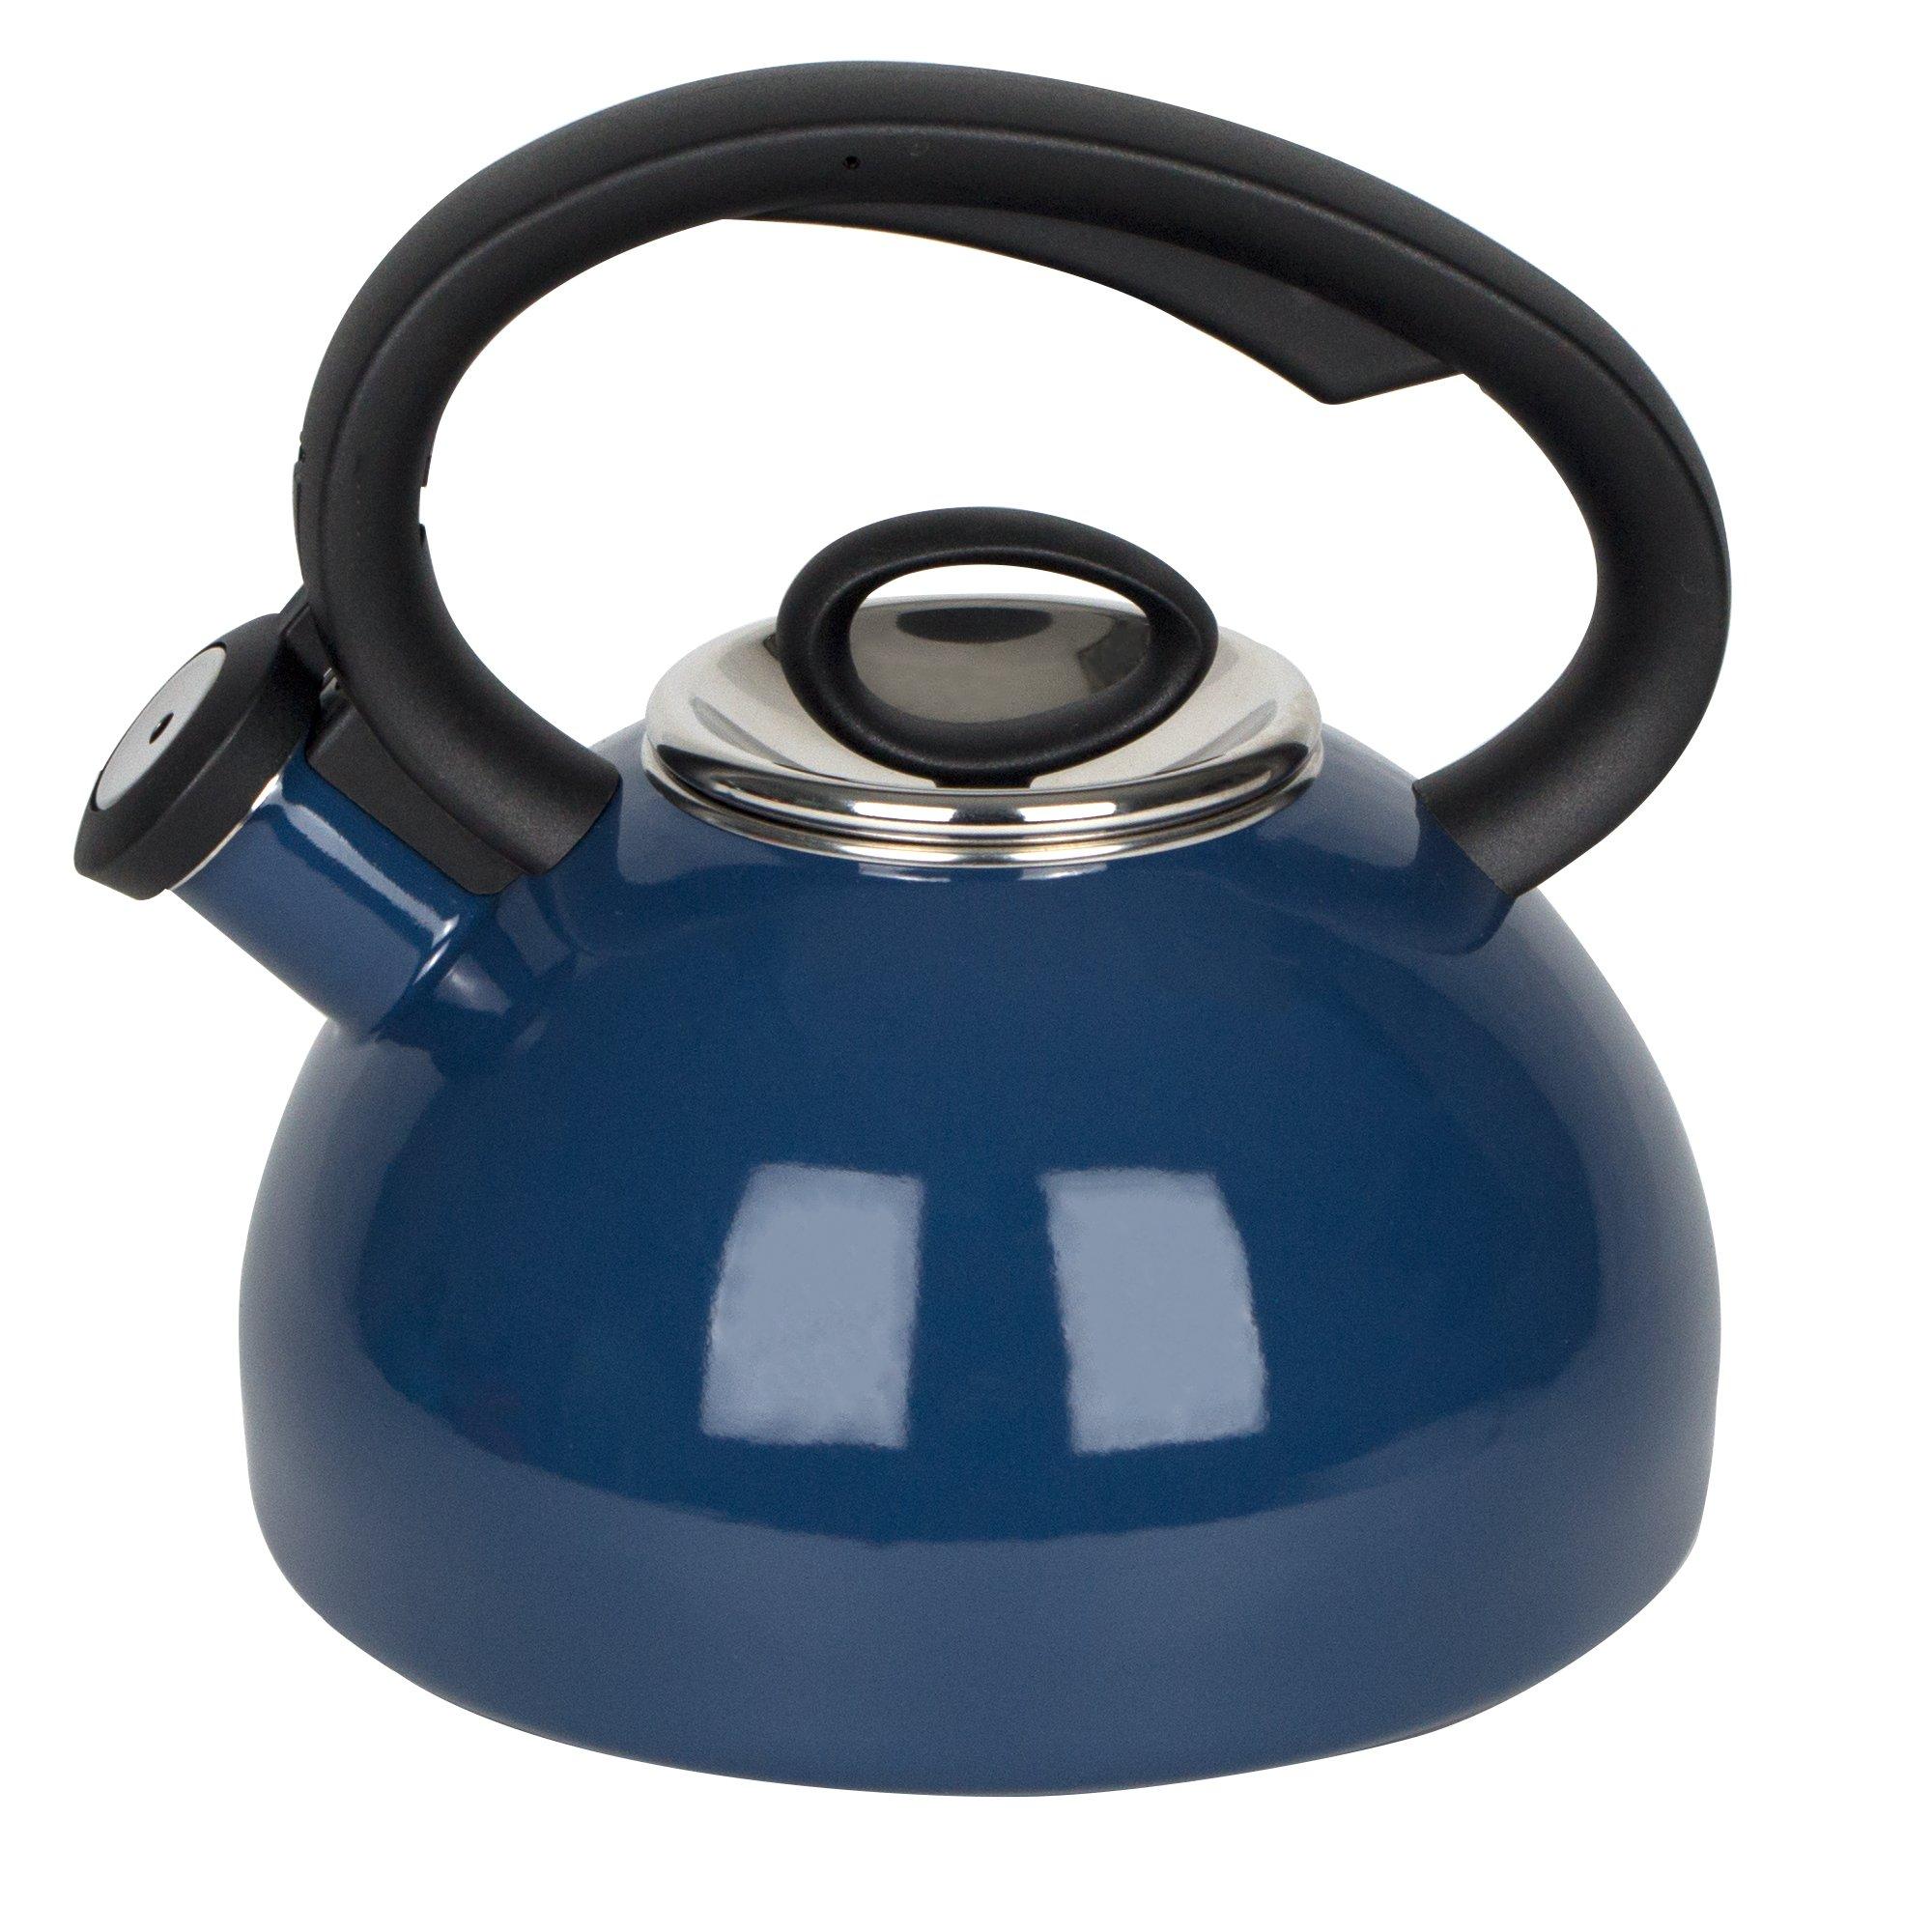 Porcelain Enameled Tea Kettles 2-Quart - Soft Whistling Hot Water Kettle - Cobalt Blue Teapot by AIDEA